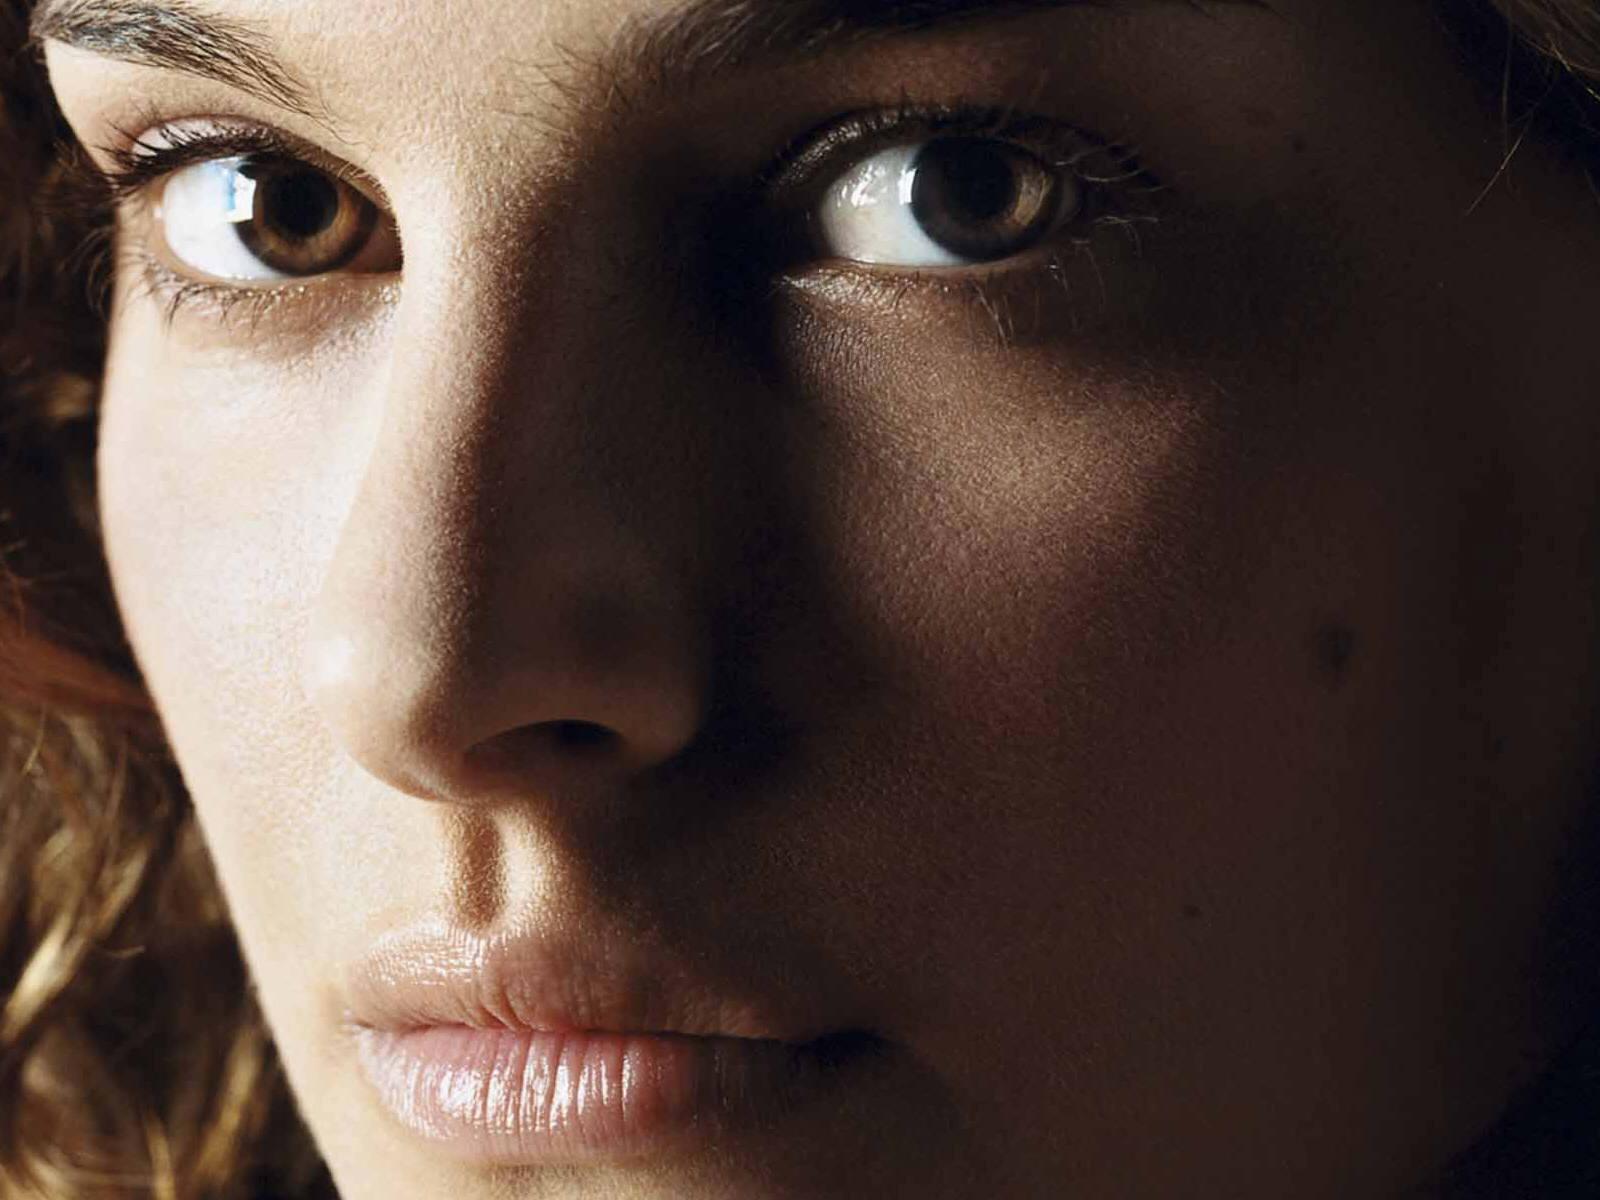 http://1.bp.blogspot.com/-UmprU4Z6KTw/Tr_92jUpJqI/AAAAAAAAJLU/_X3sVD0LW00/s1600/Natalie_Portman_HD_Wallpaper_eyes.jpg